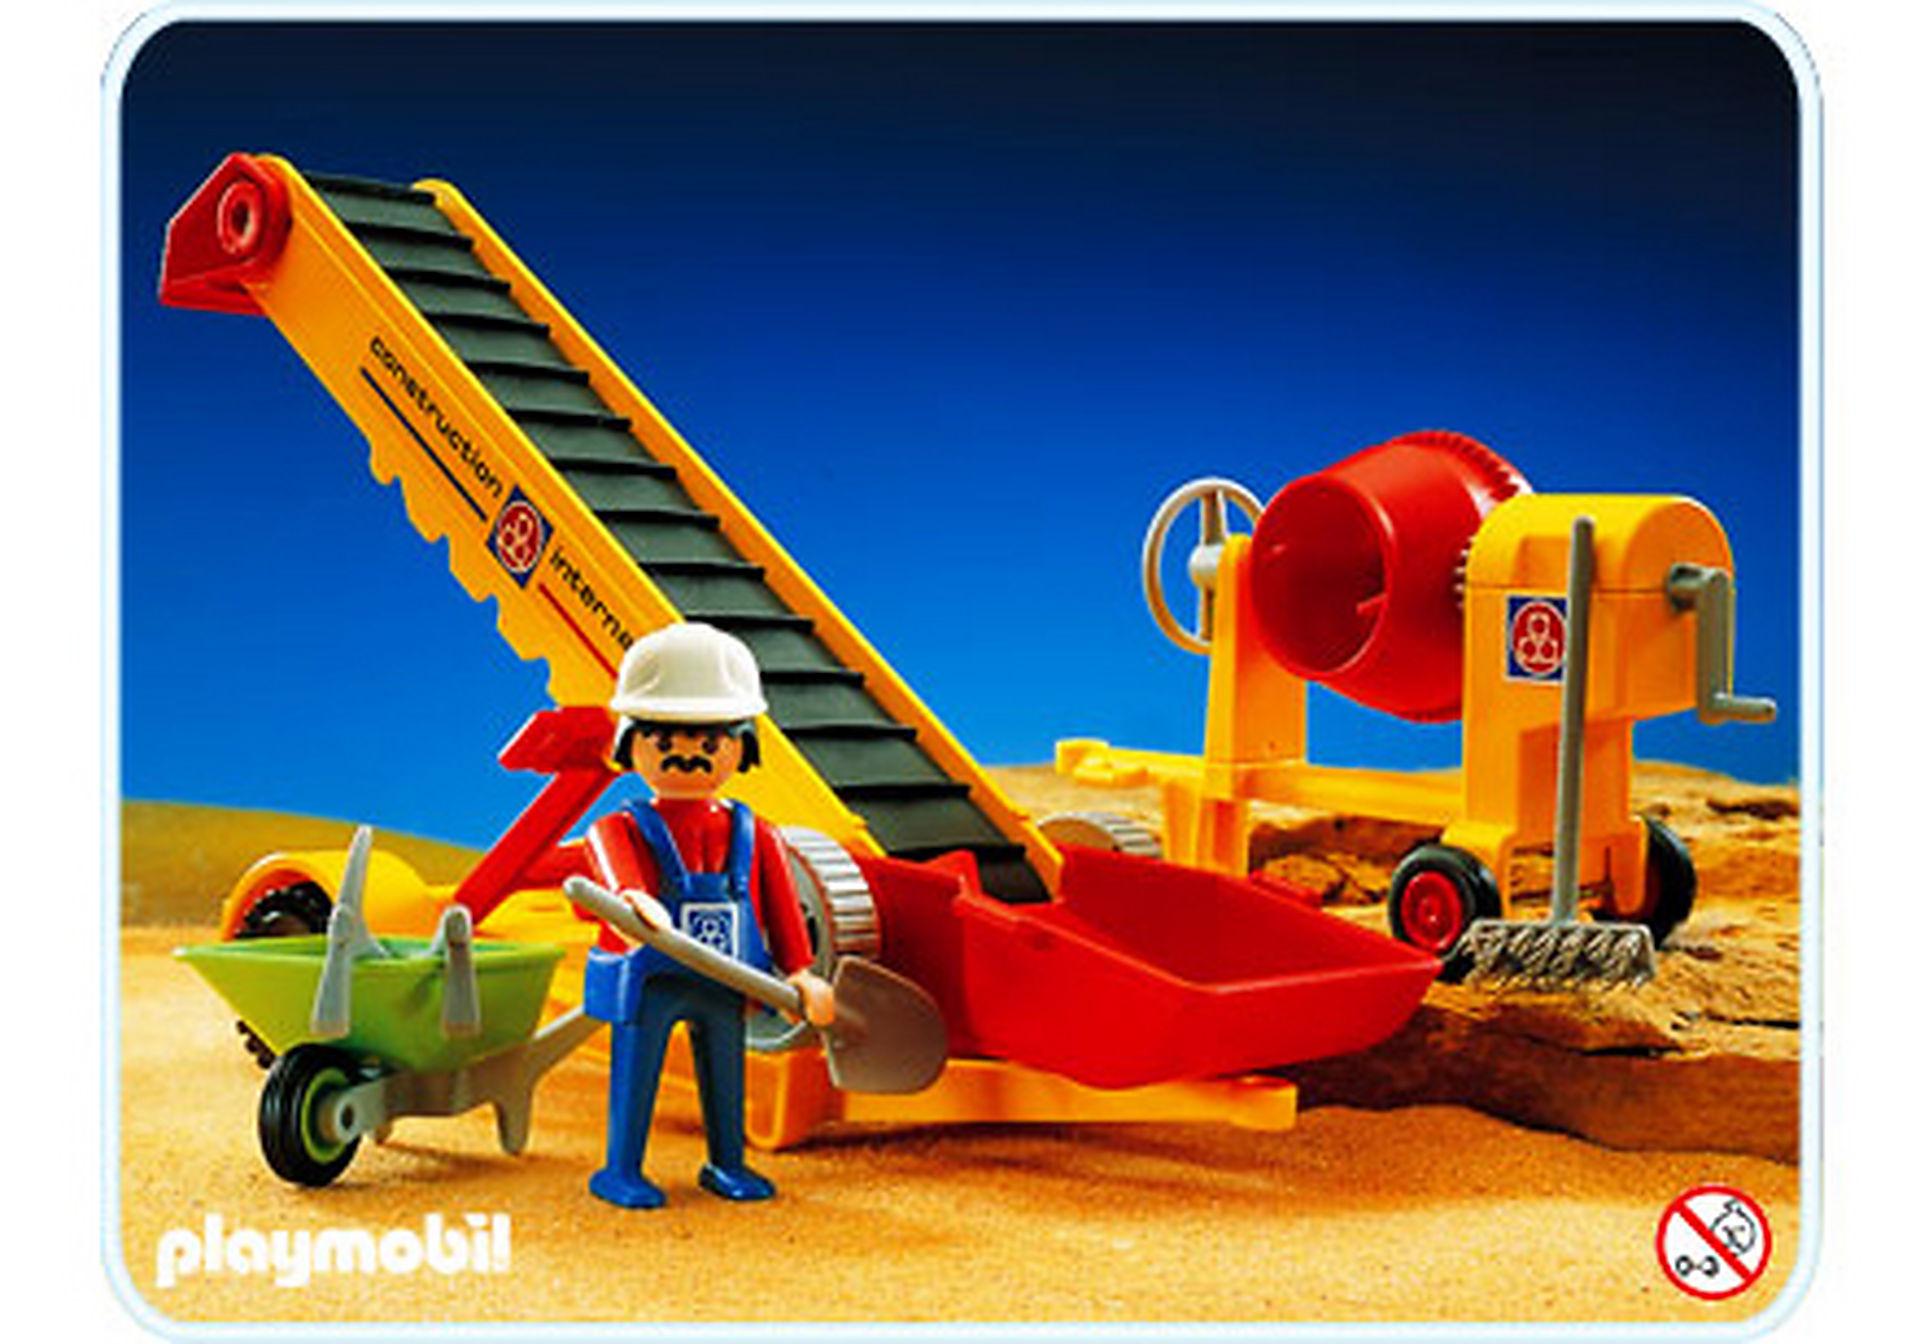 http://media.playmobil.com/i/playmobil/3759-A_product_detail/Transporteur à bande + bétonnière